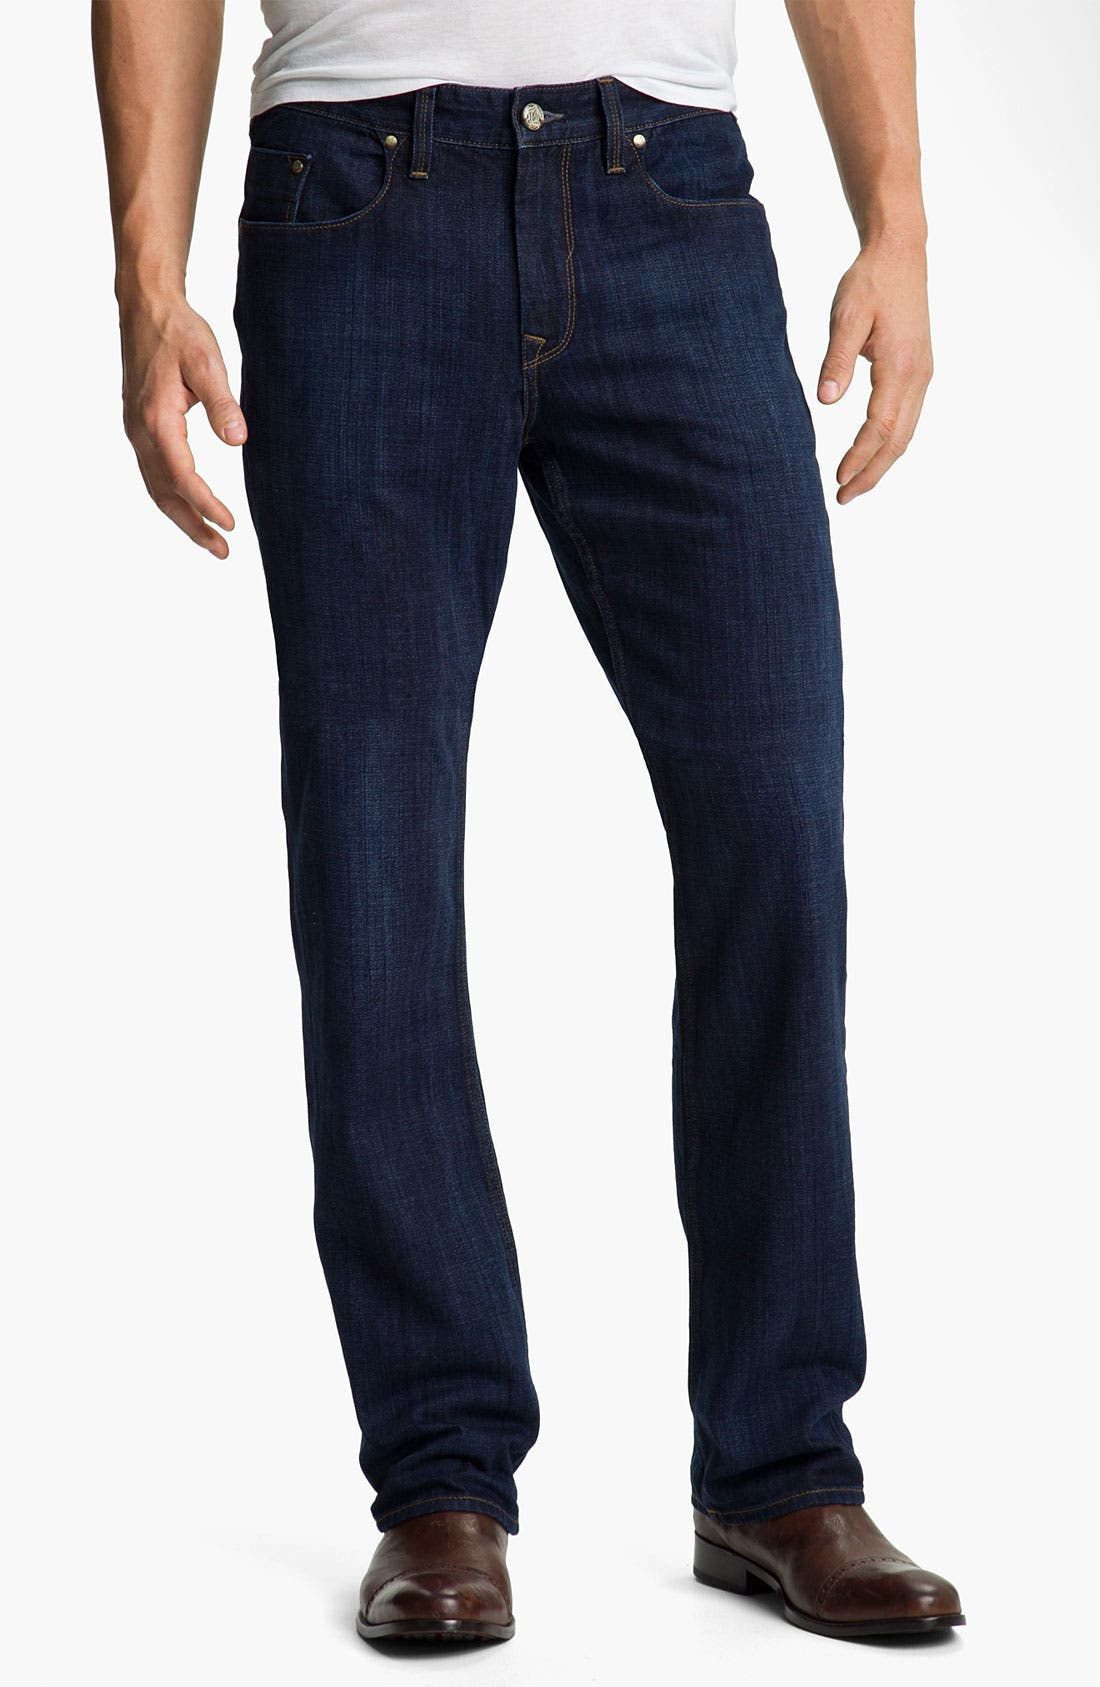 Alternate Image 1 Selected - Robert Graham Jeans 'Simply Blue' Straight Leg Jeans (Indigo)